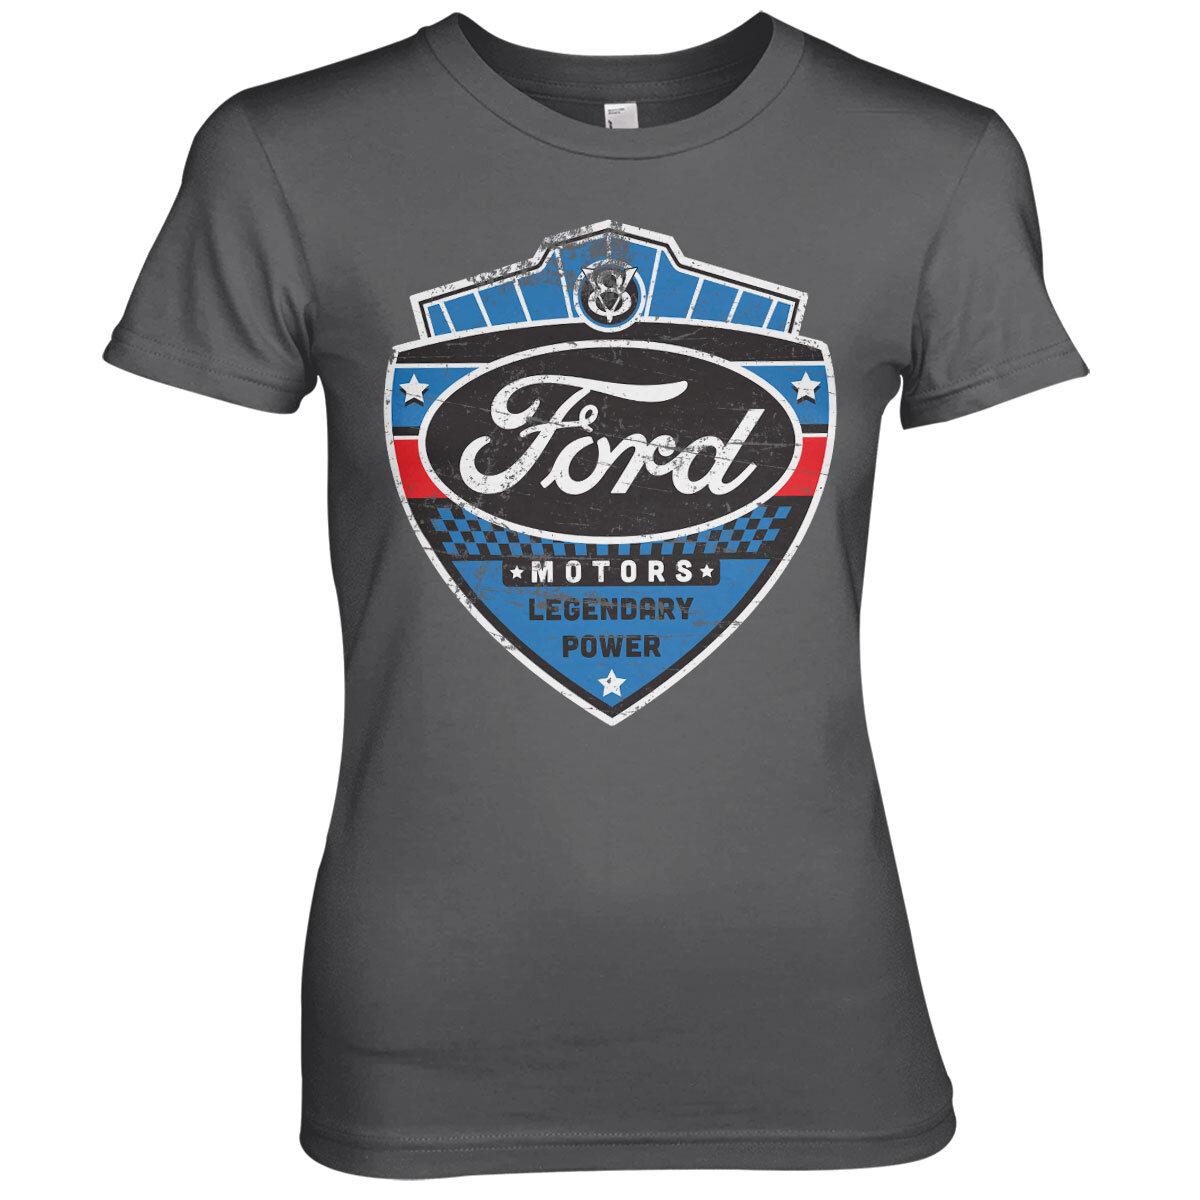 Ford - Legendary Power Girly Tee